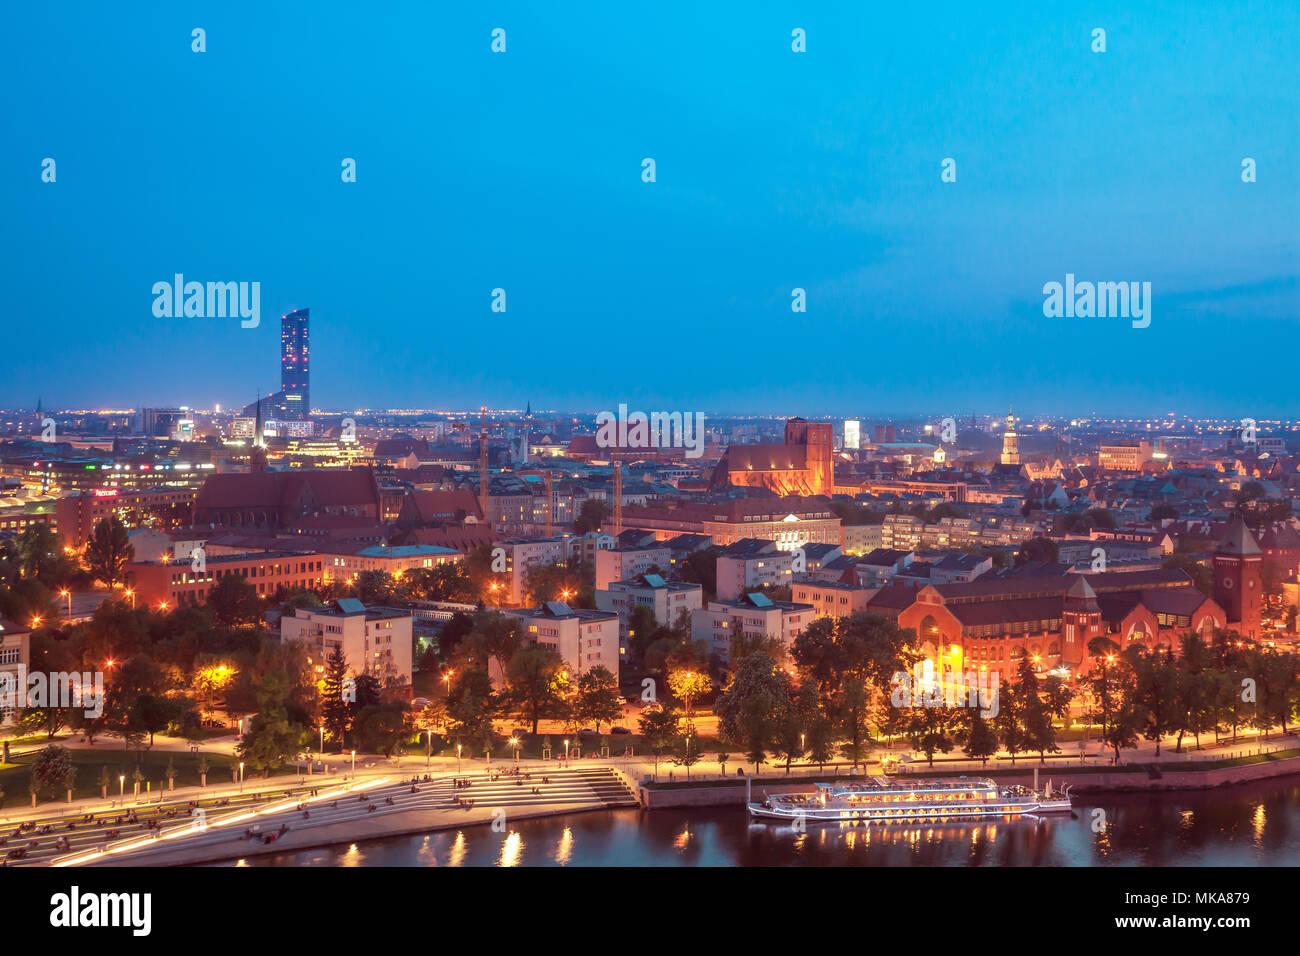 Wroclaw Poland - Stock Image